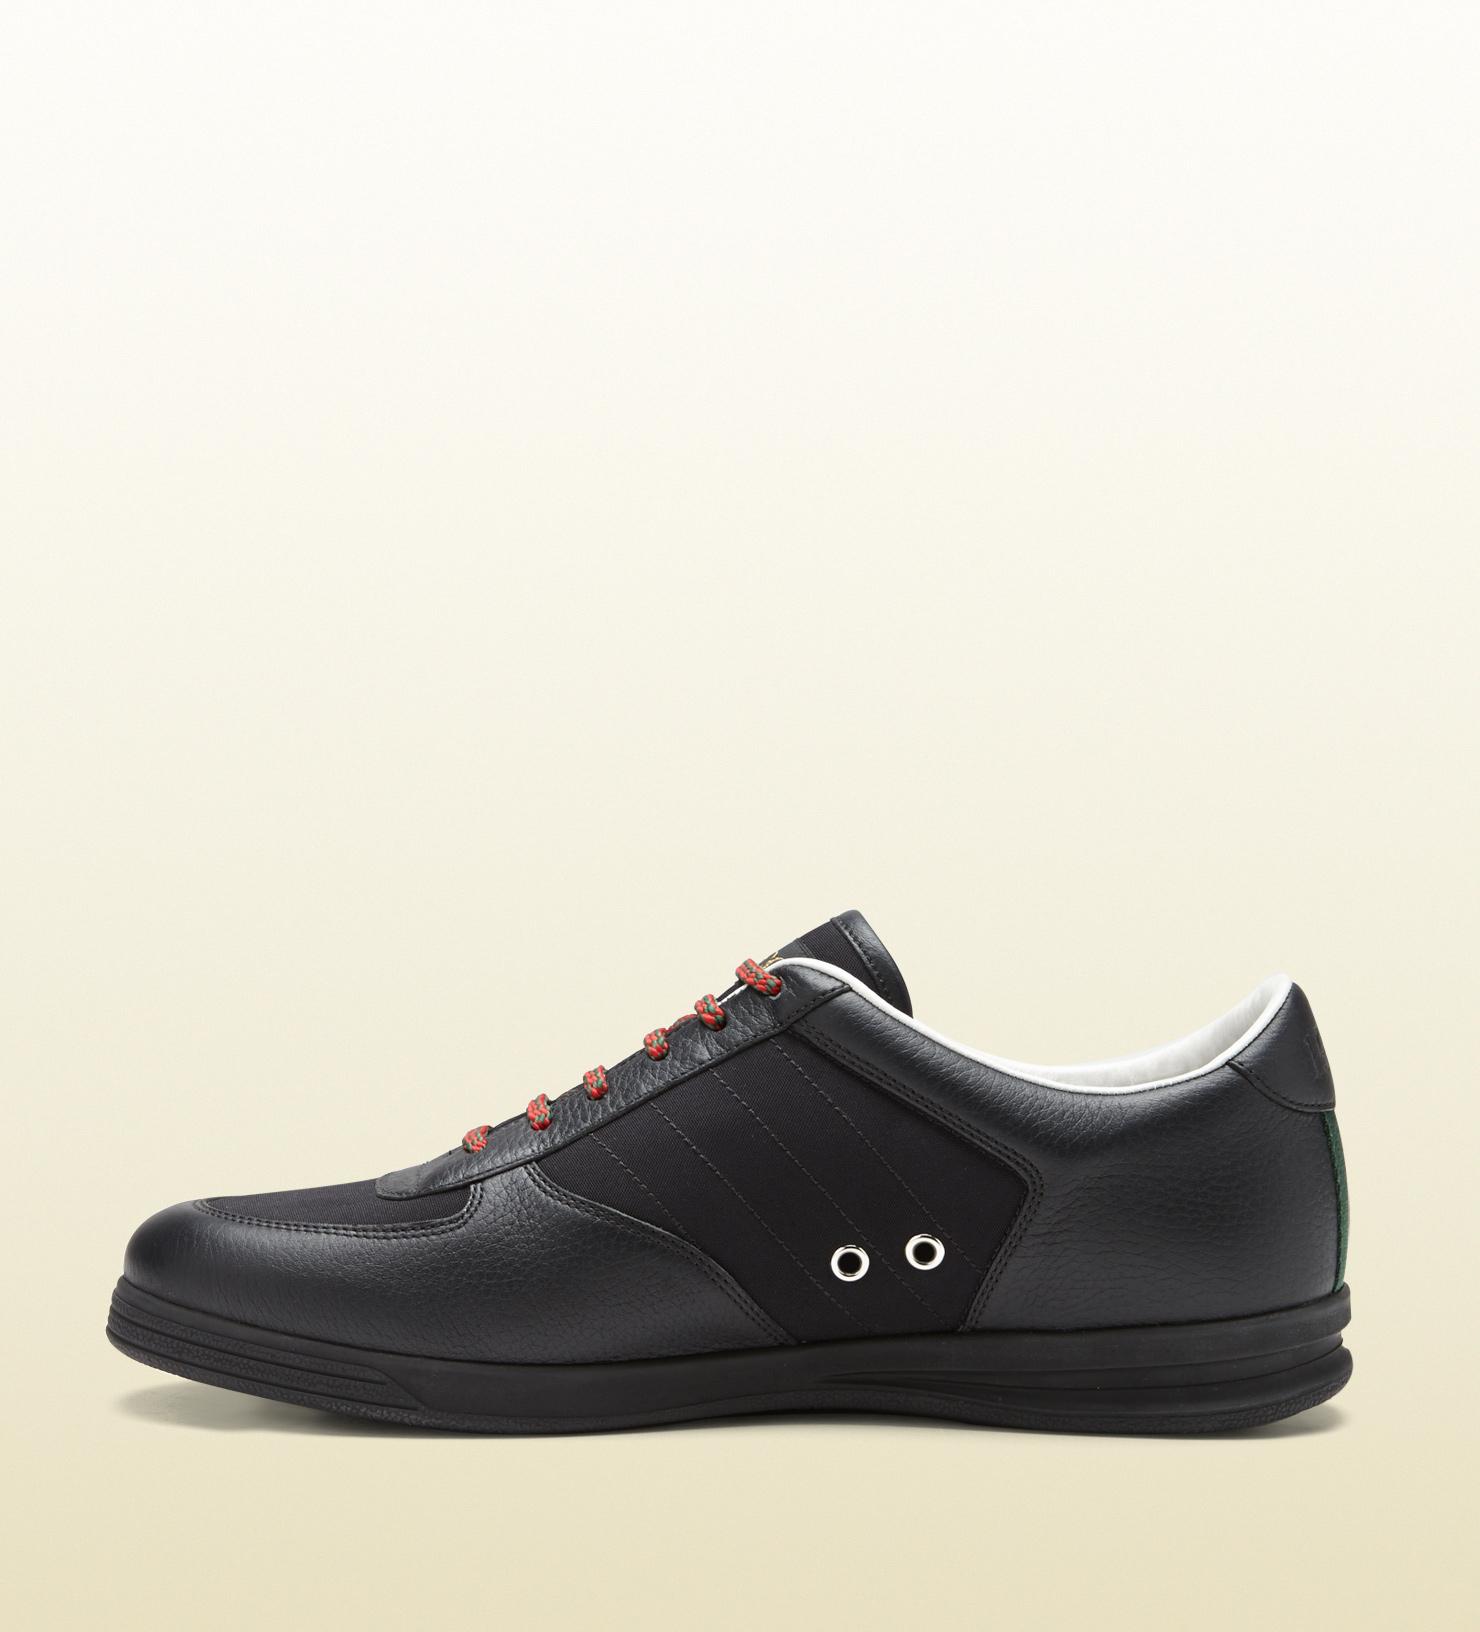 ddf4201227b Lyst - Gucci 1984 Low Top Sneaker In Leather in Black for Men